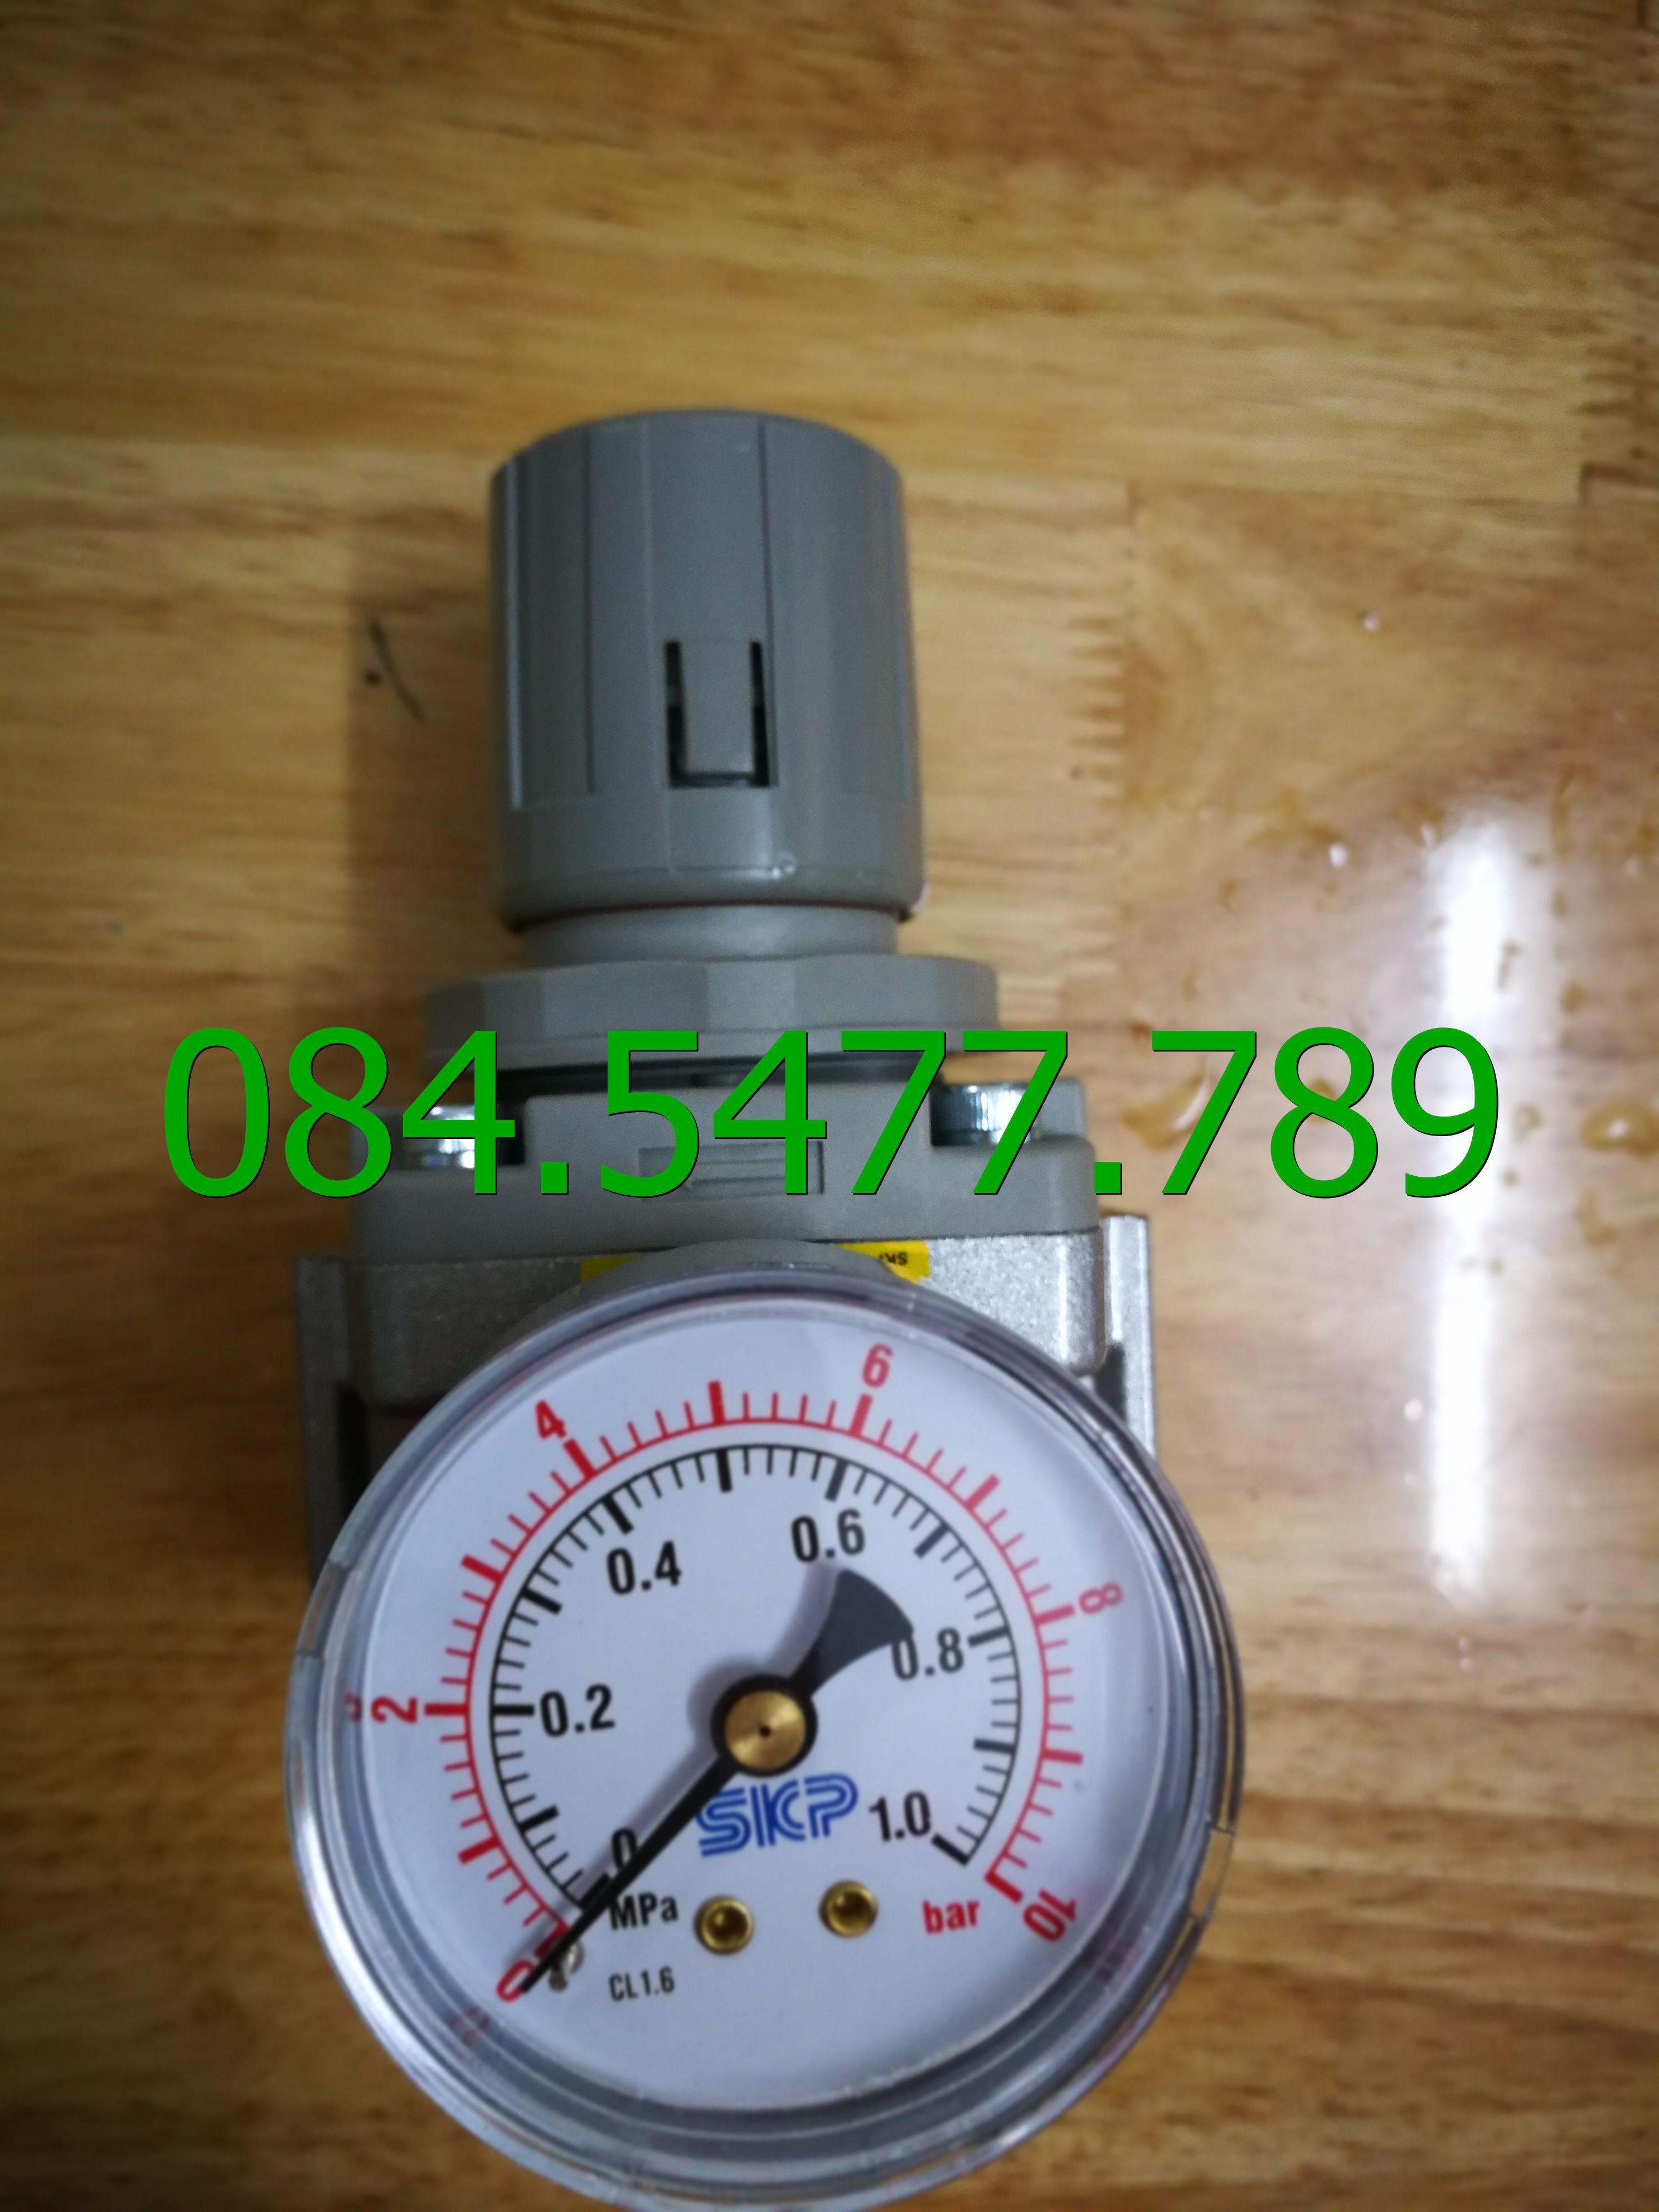 Bộ điều chỉnh áp suất khí nén SAR6000M-10BG